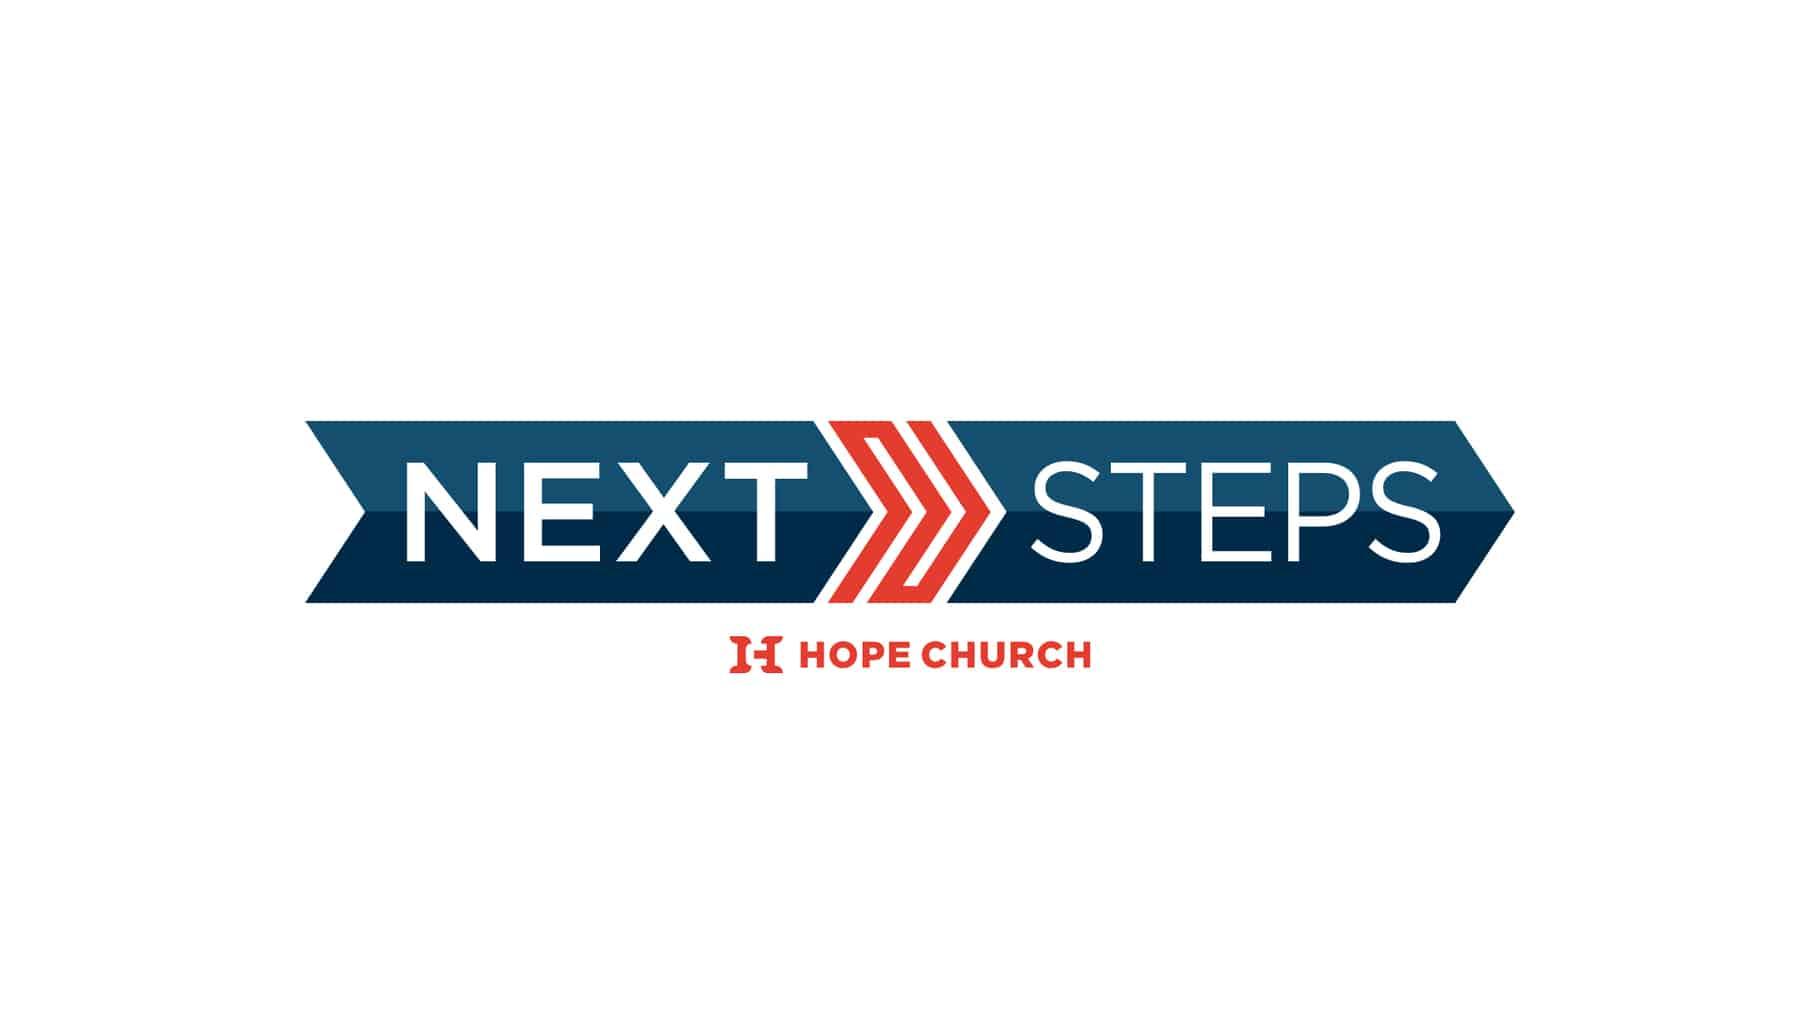 Banner for Hope Church's Next Steps